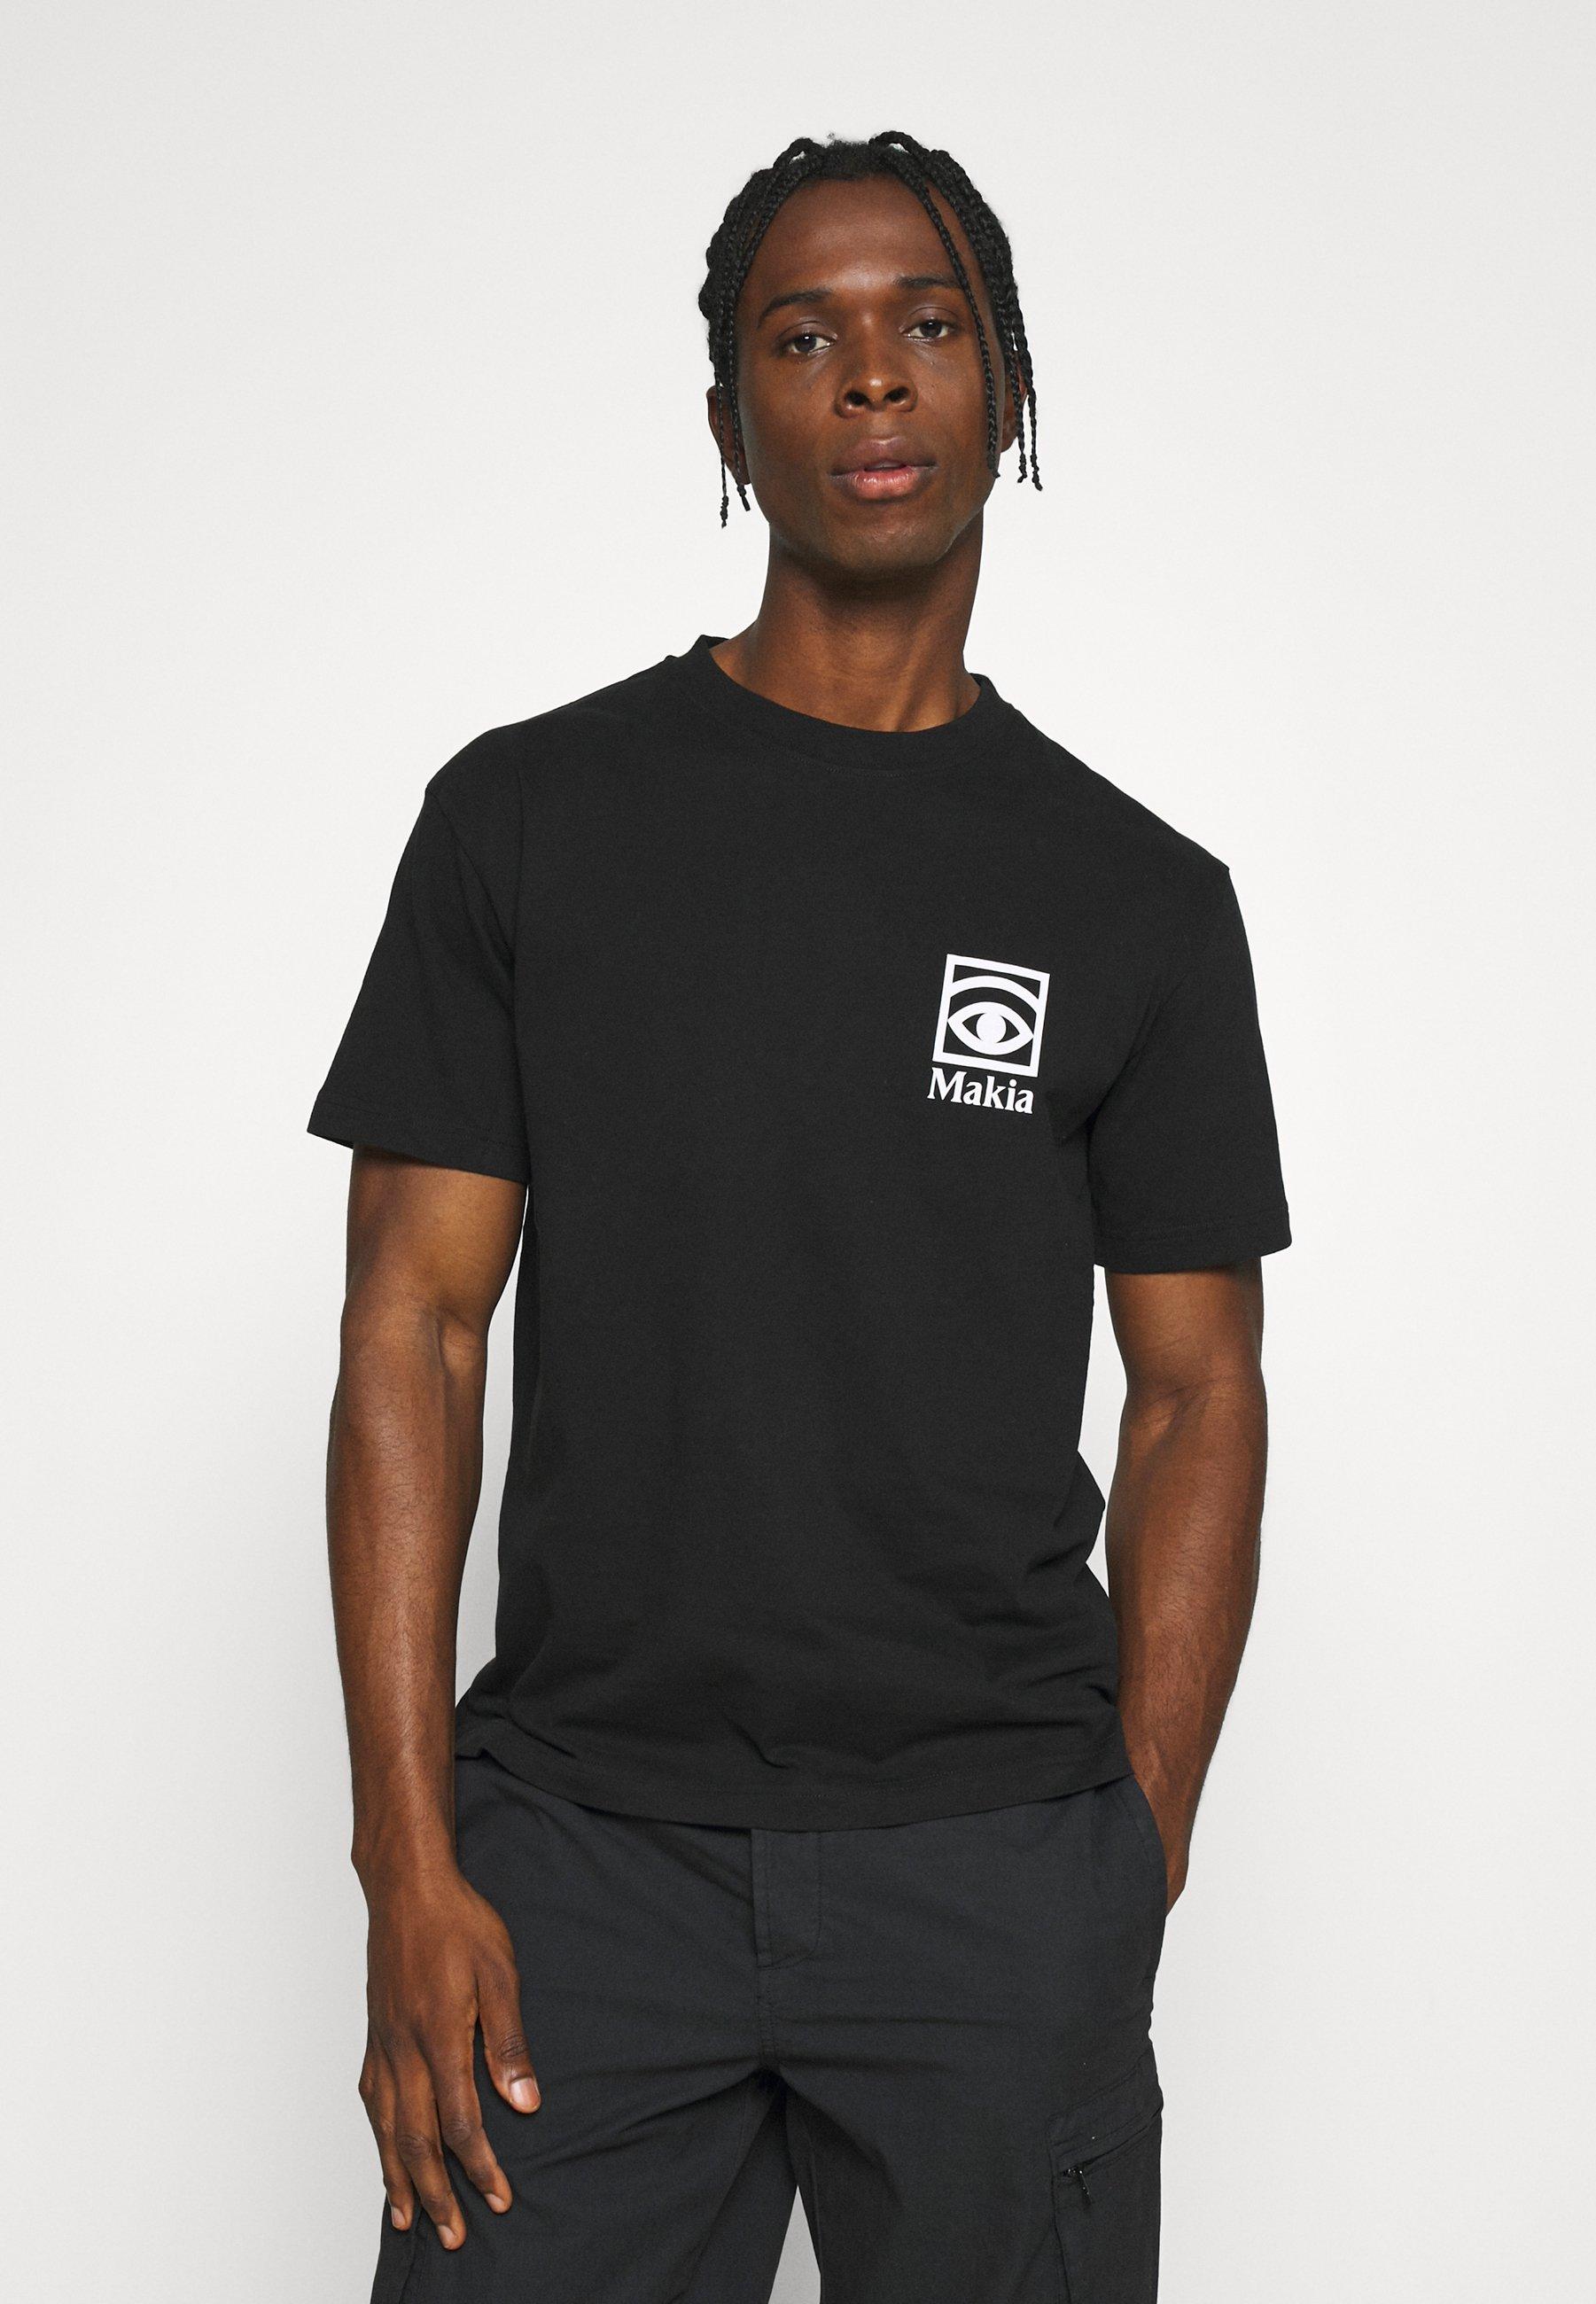 Men Makia x Olle Eksell Ögon T-Shirt - Print T-shirt